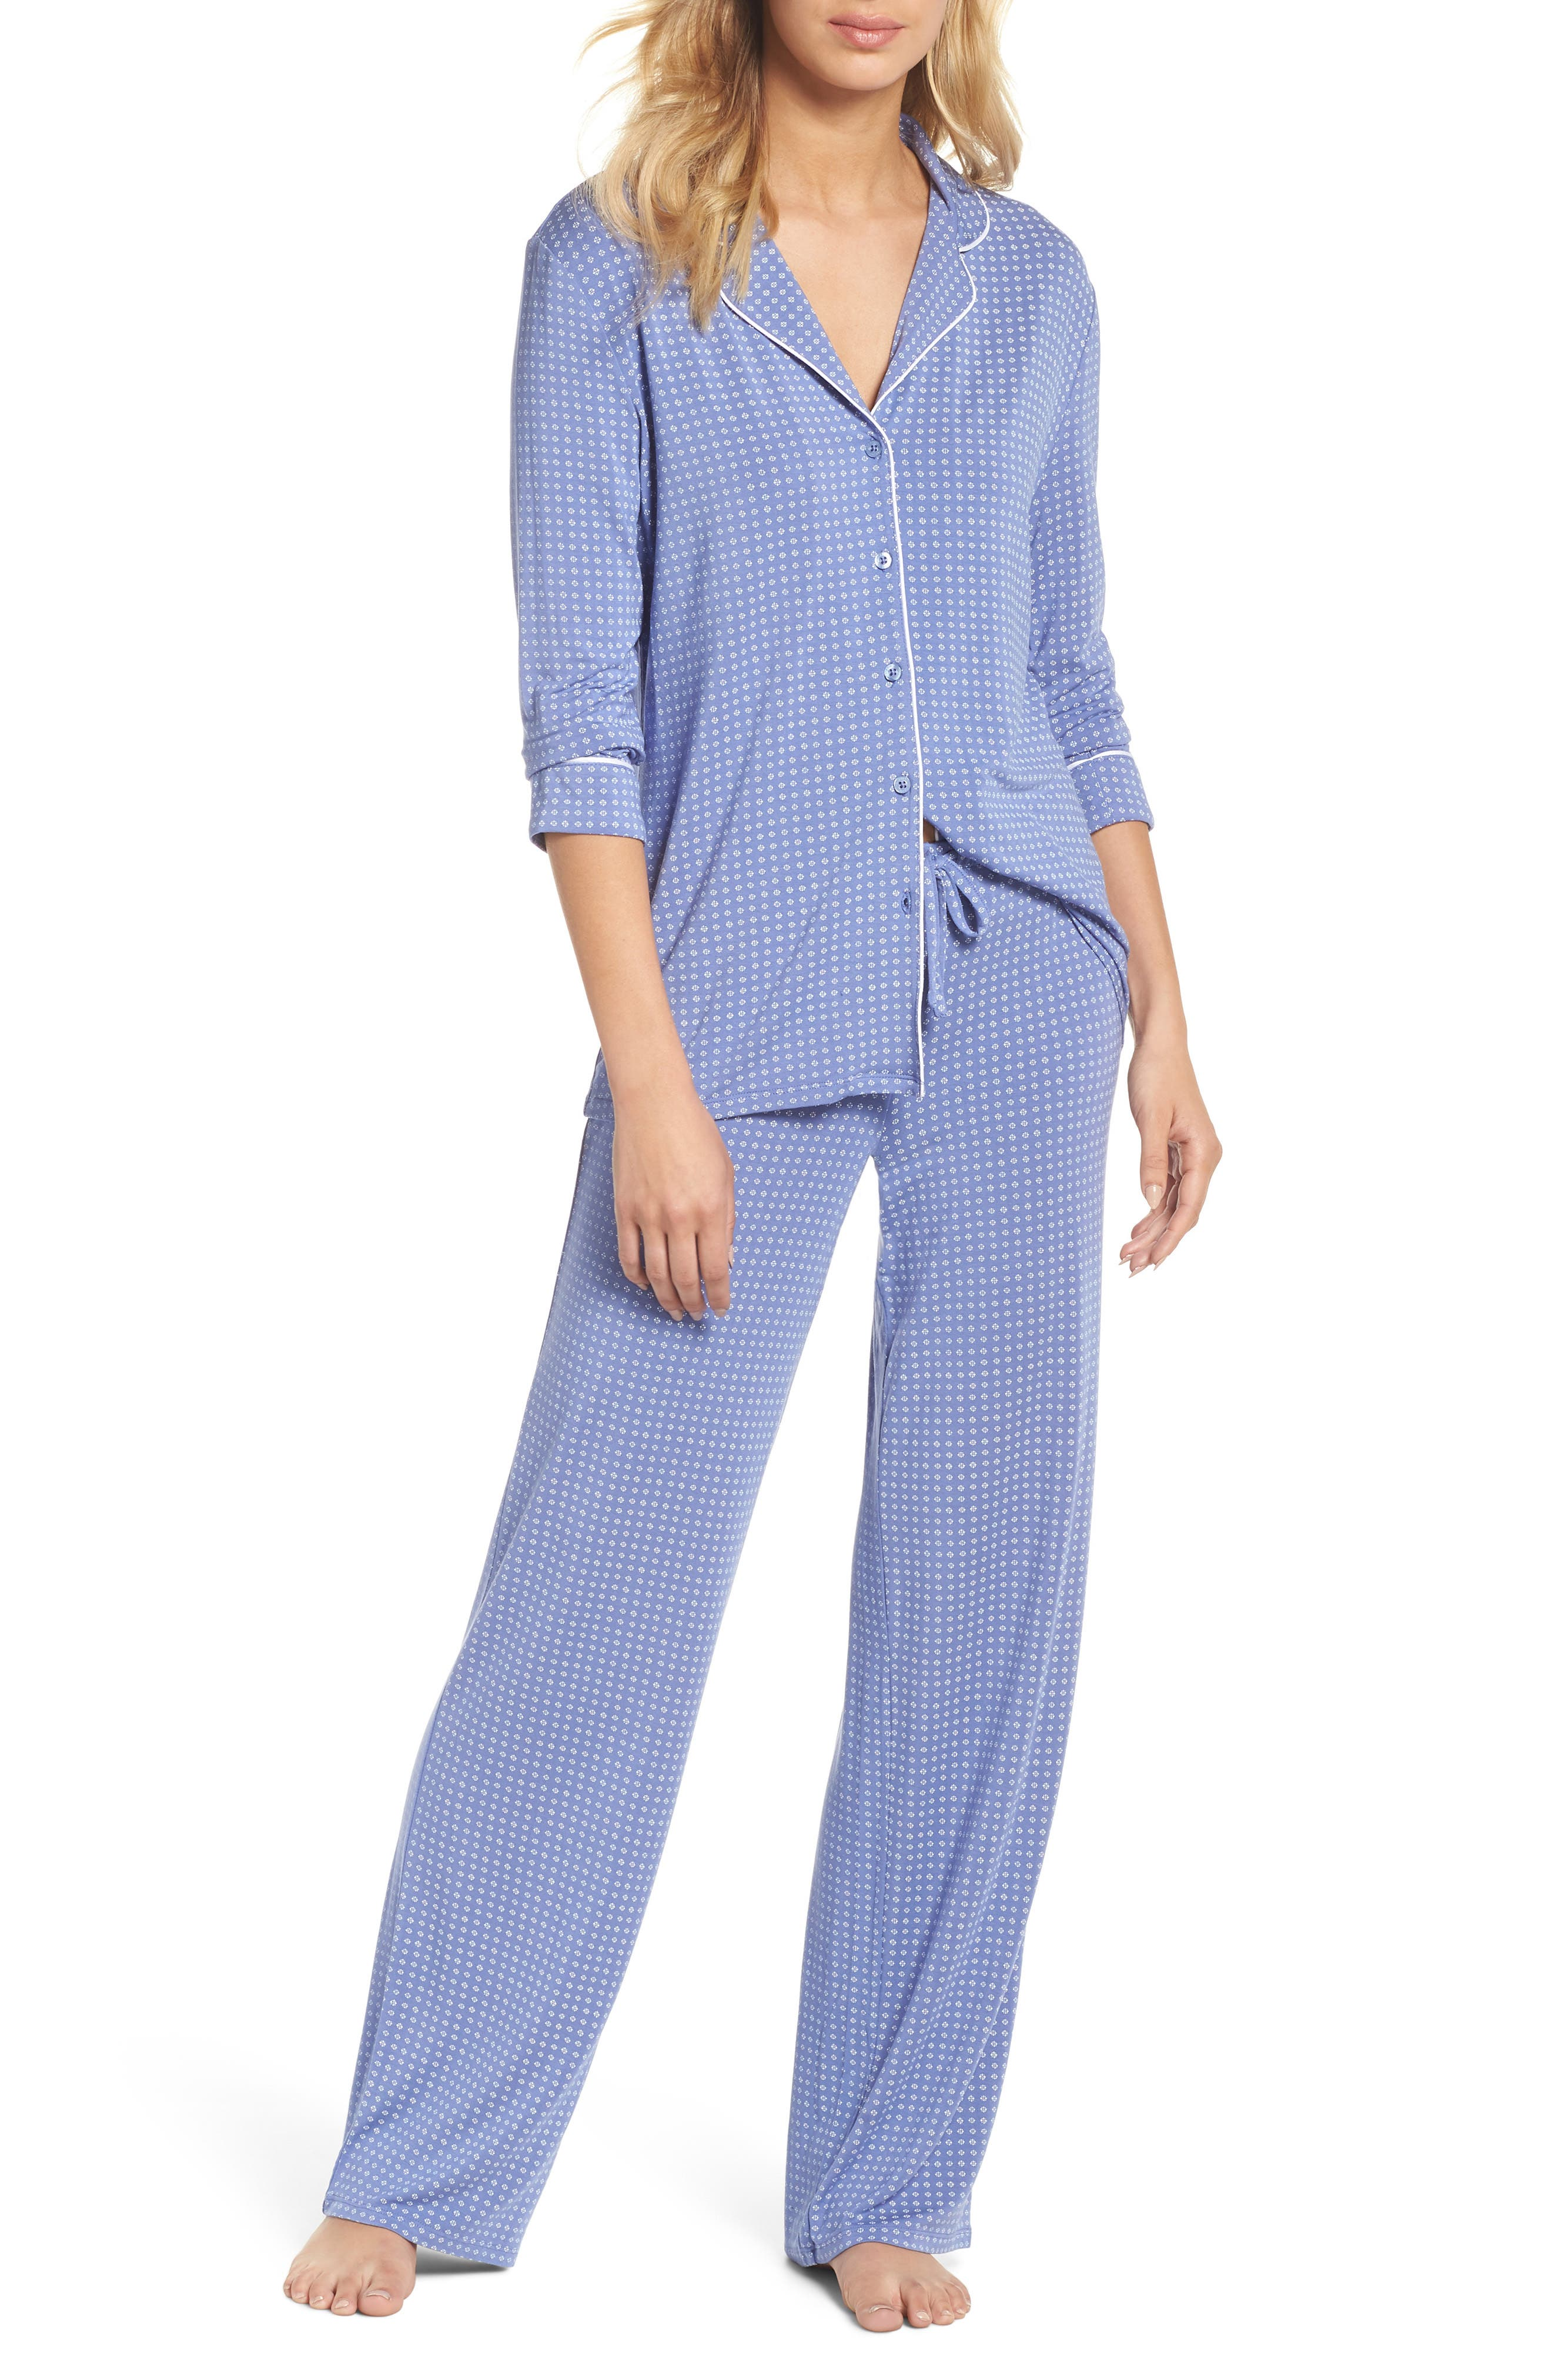 Moonlight Pajamas,                             Main thumbnail 1, color,                             Blue Denim Geo